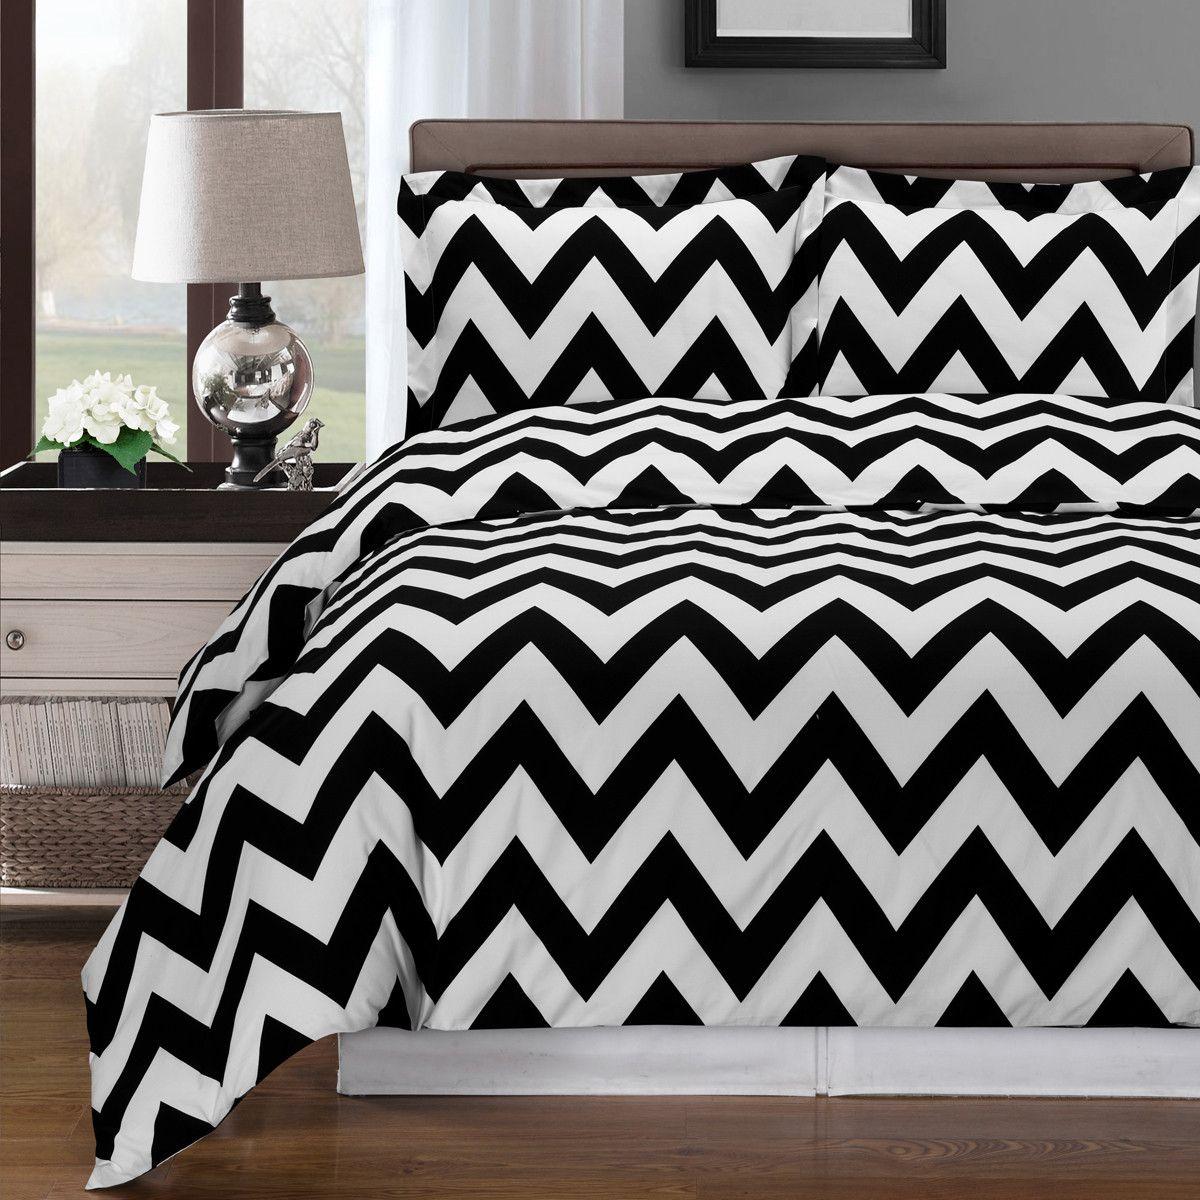 Black And White Chevron Duvet Cover Set Duvet Cover Sets